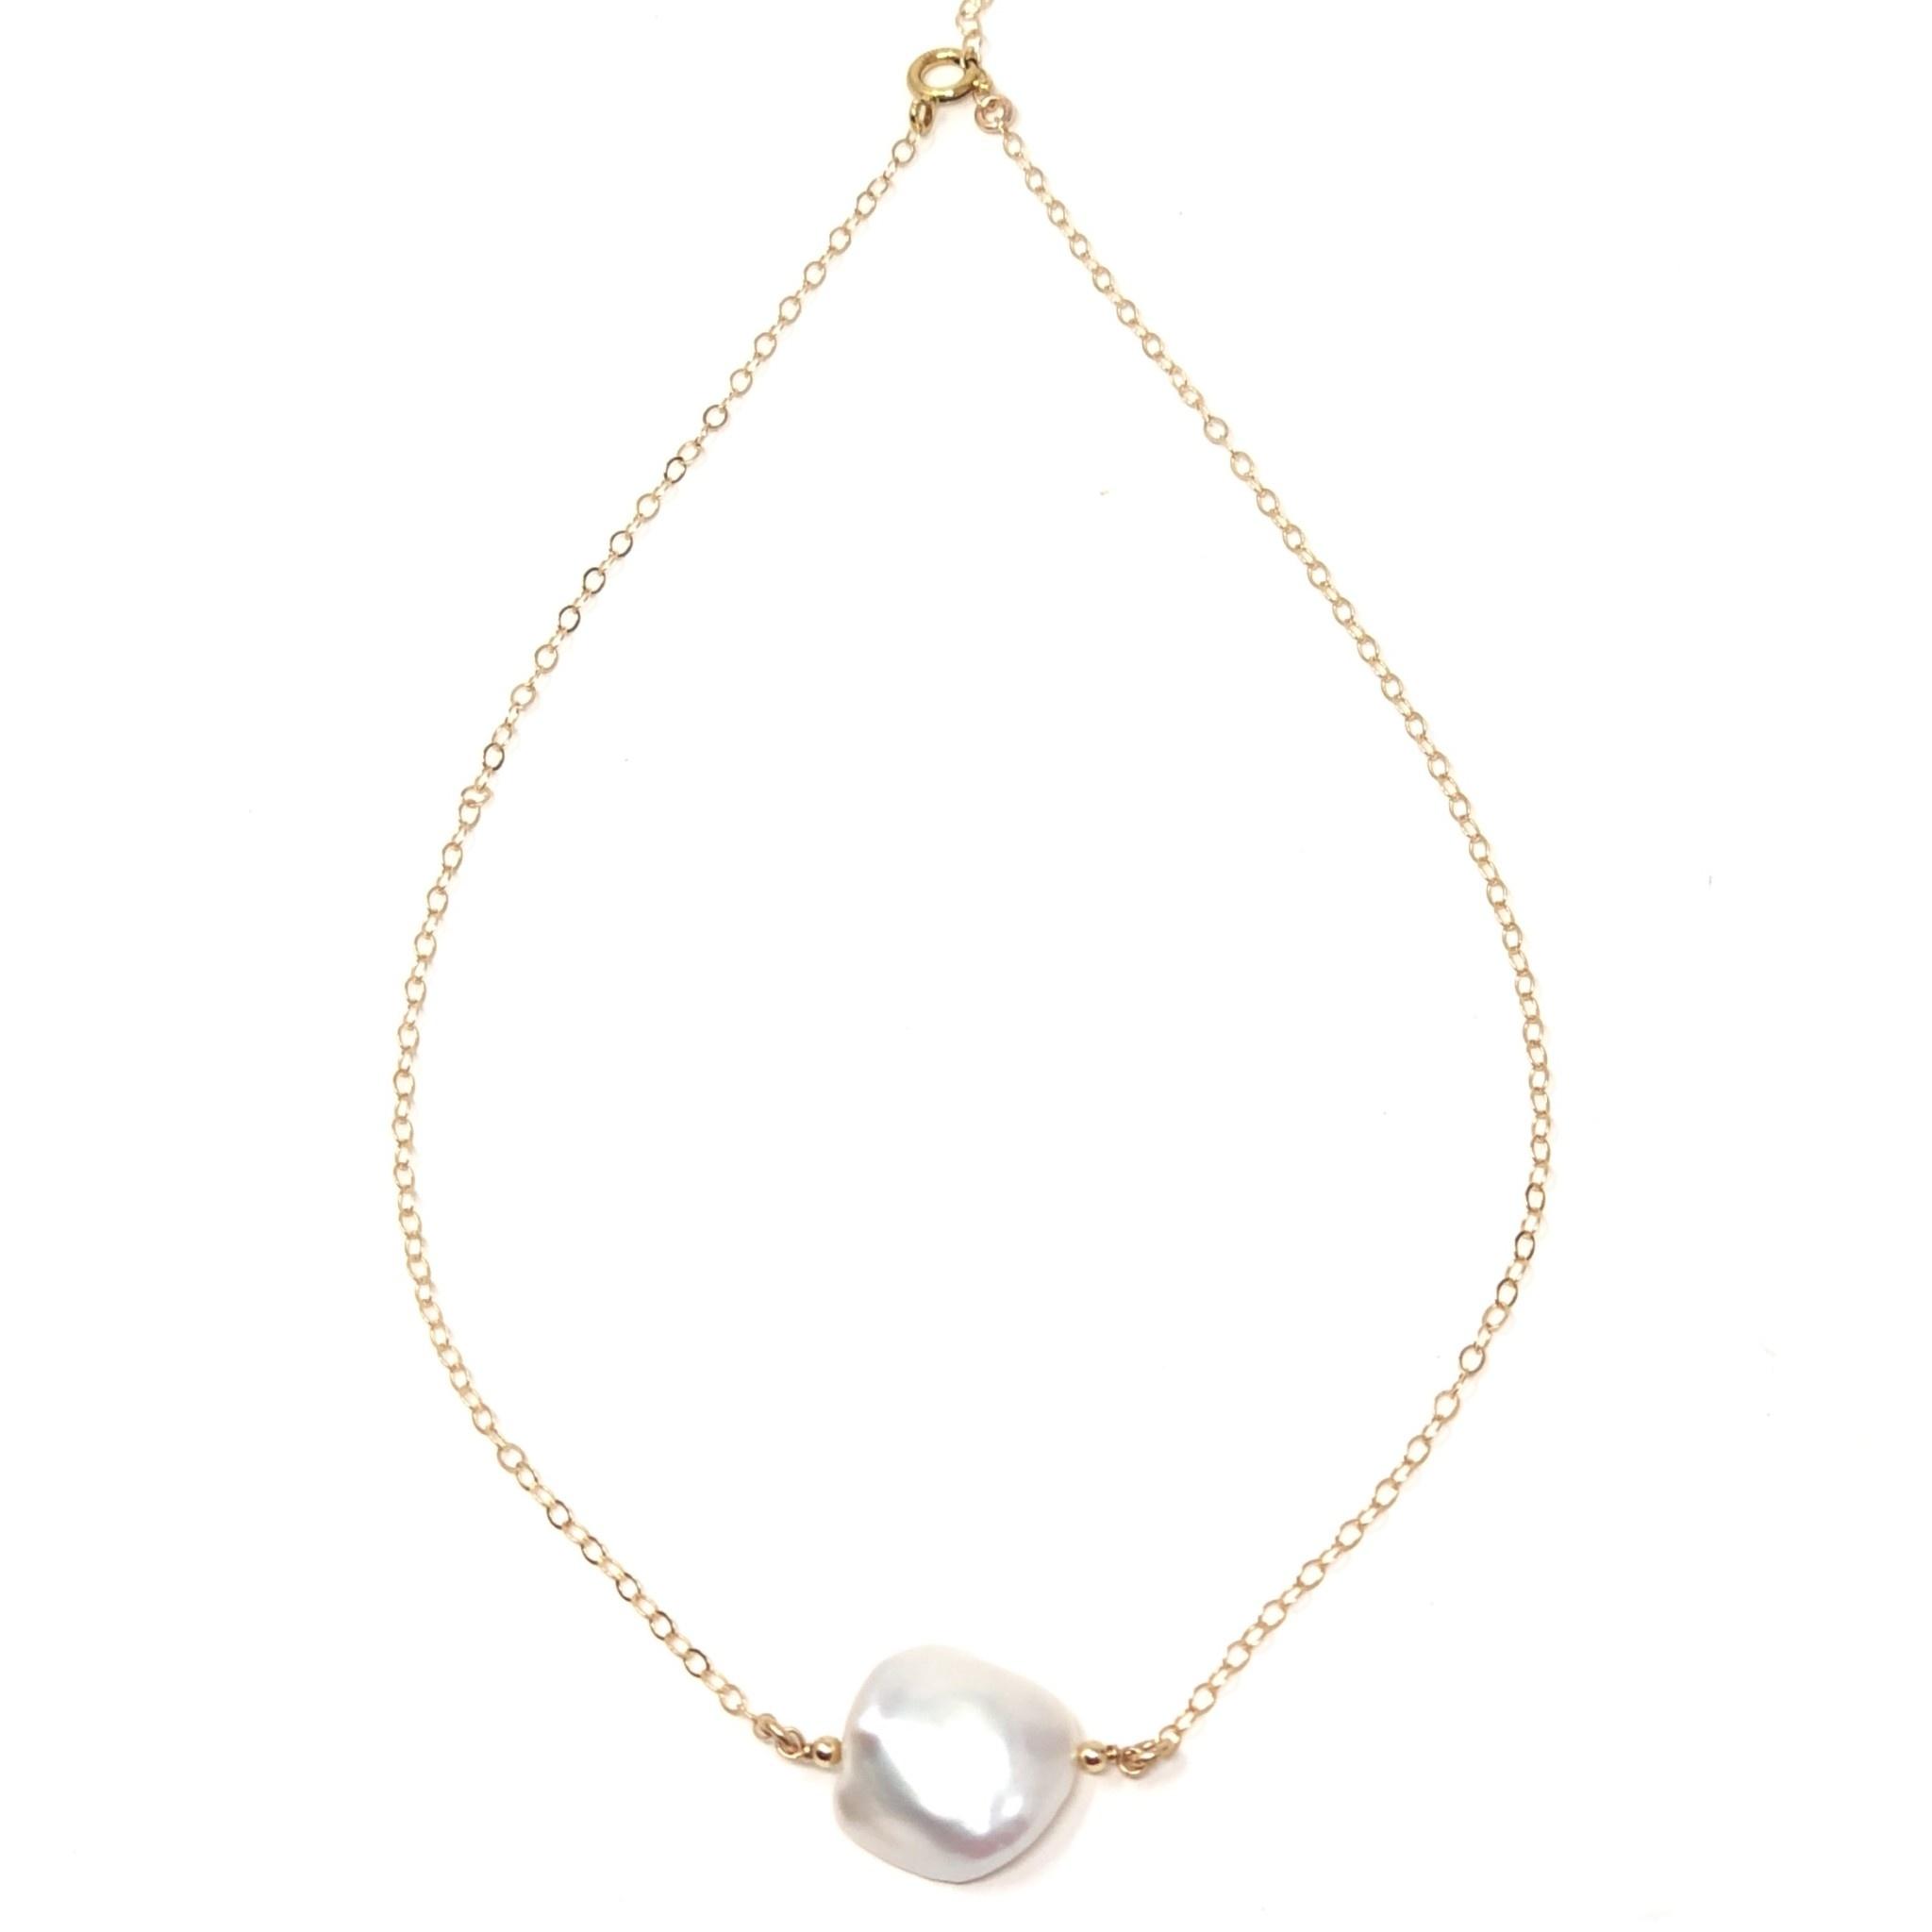 Keshi Petite Pearl on Gold Chain